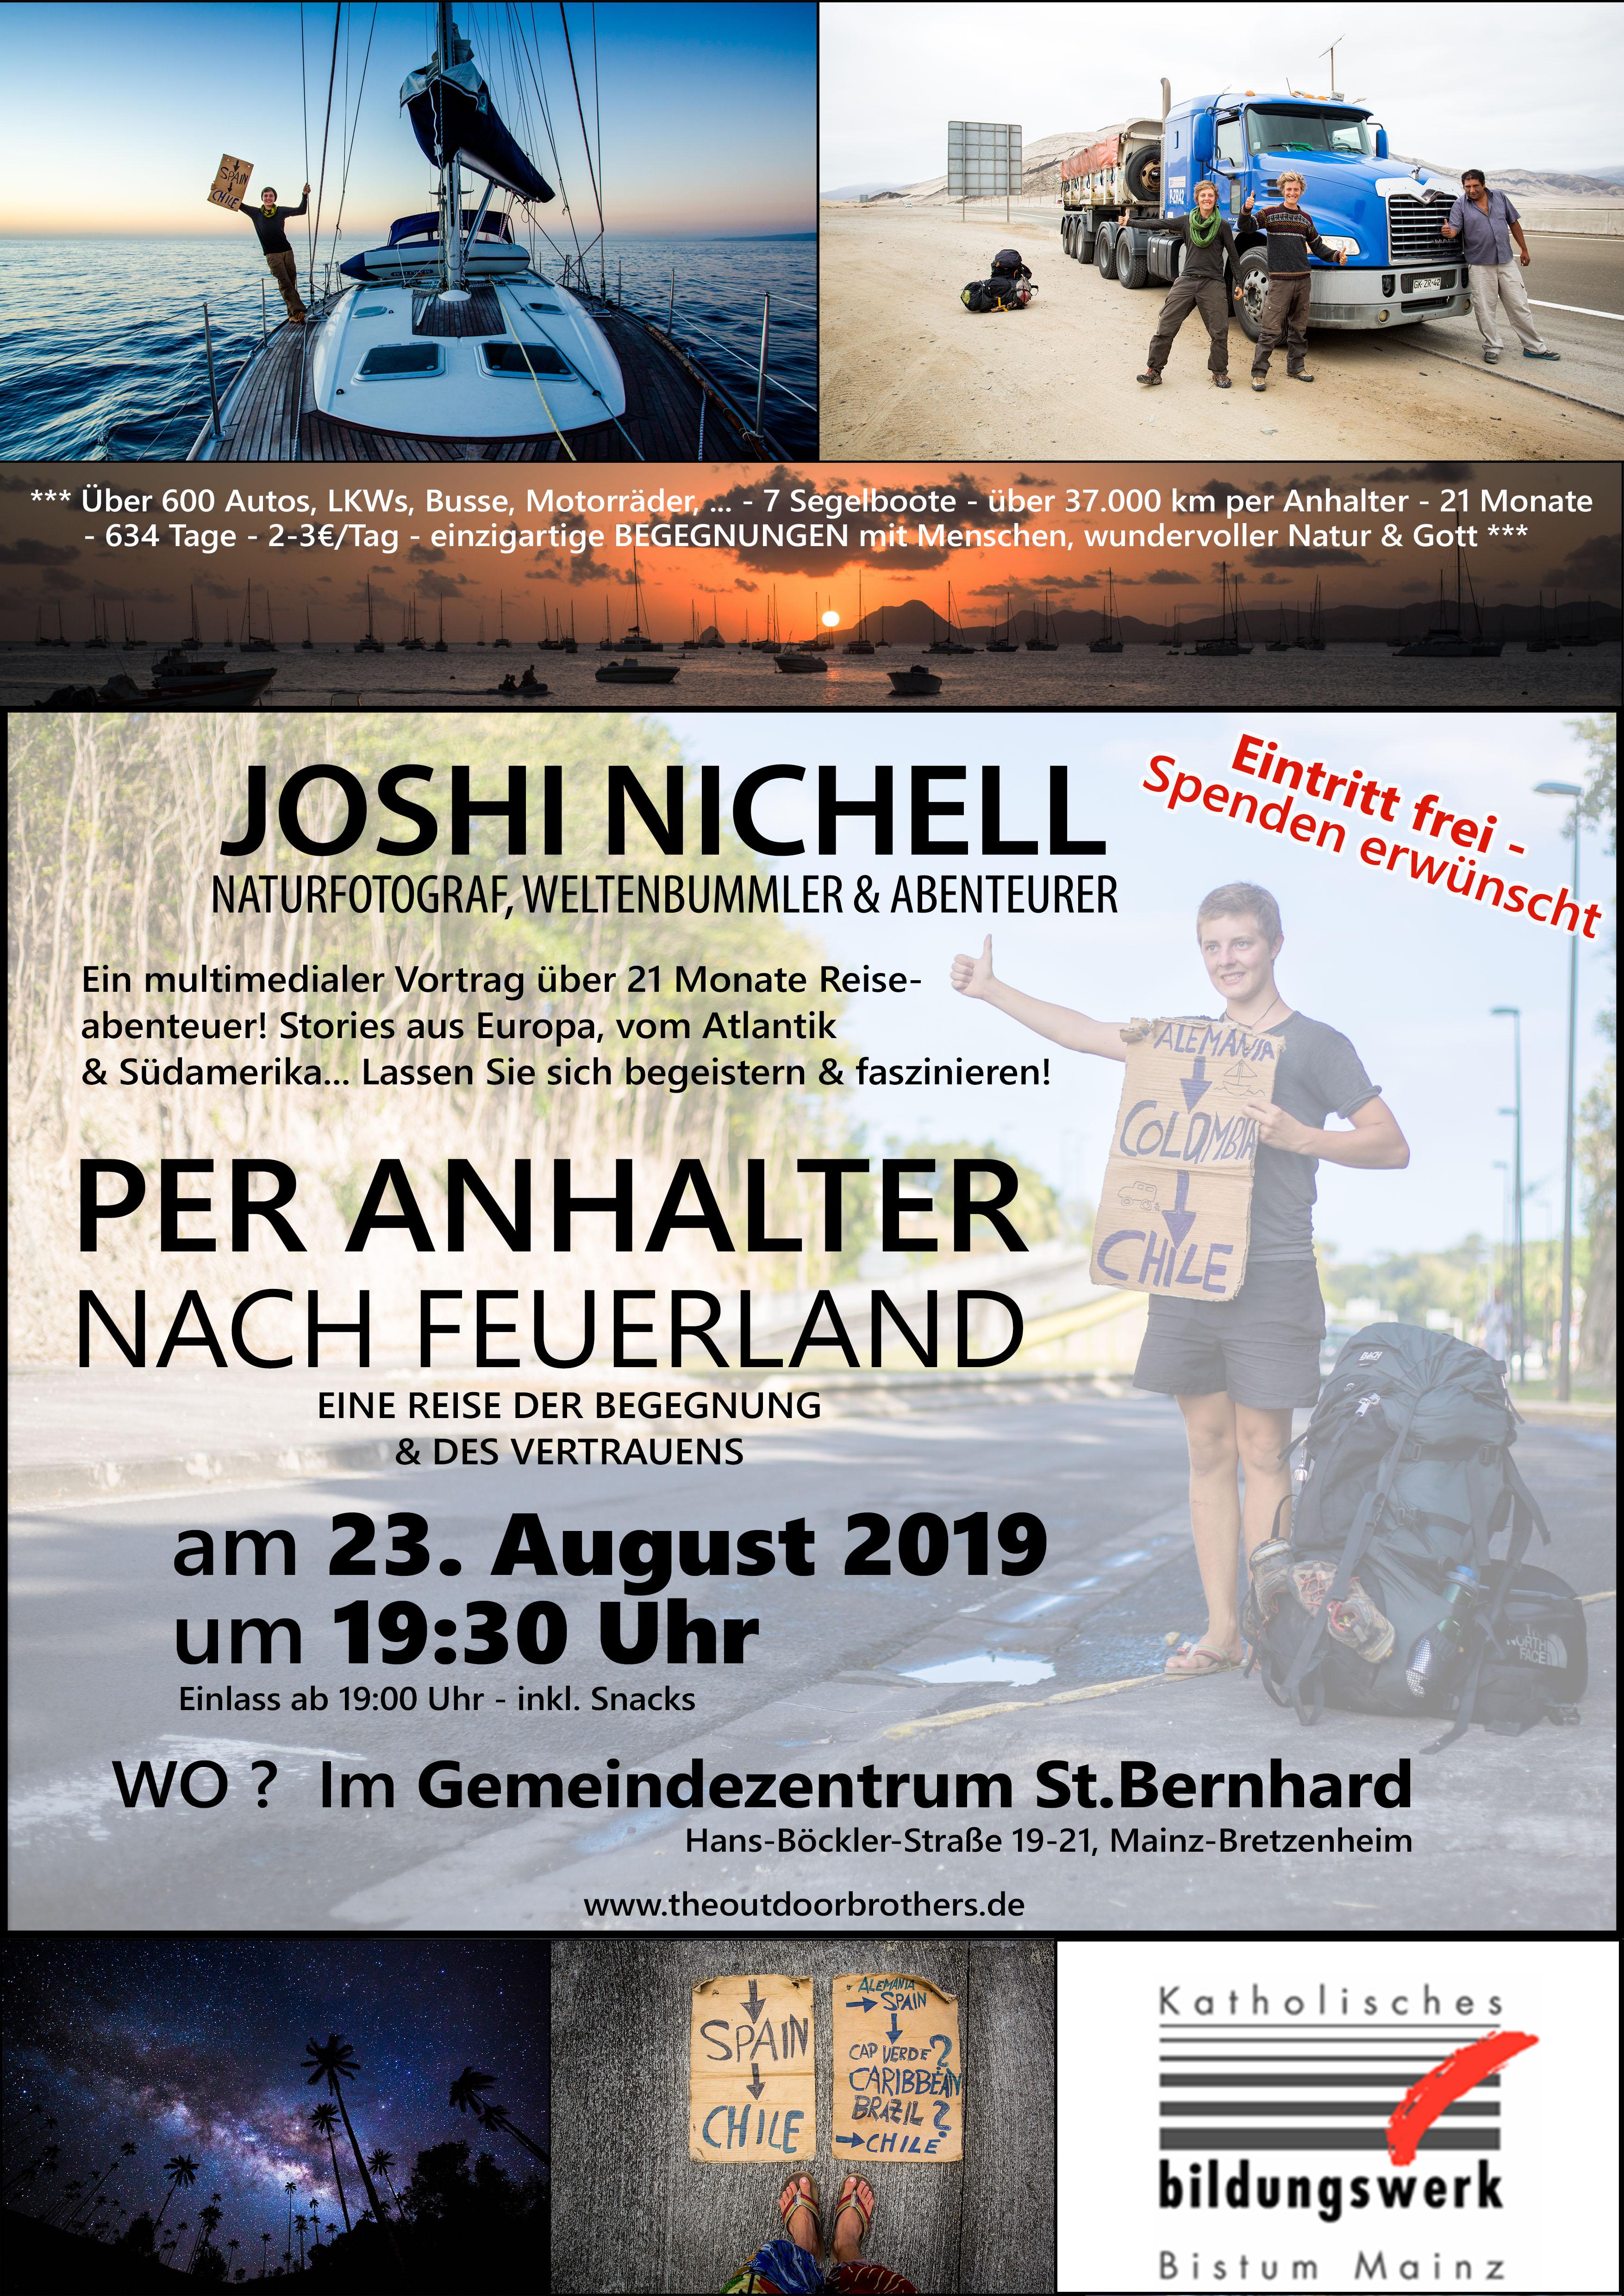 Vortragsflyer_23.8.2019